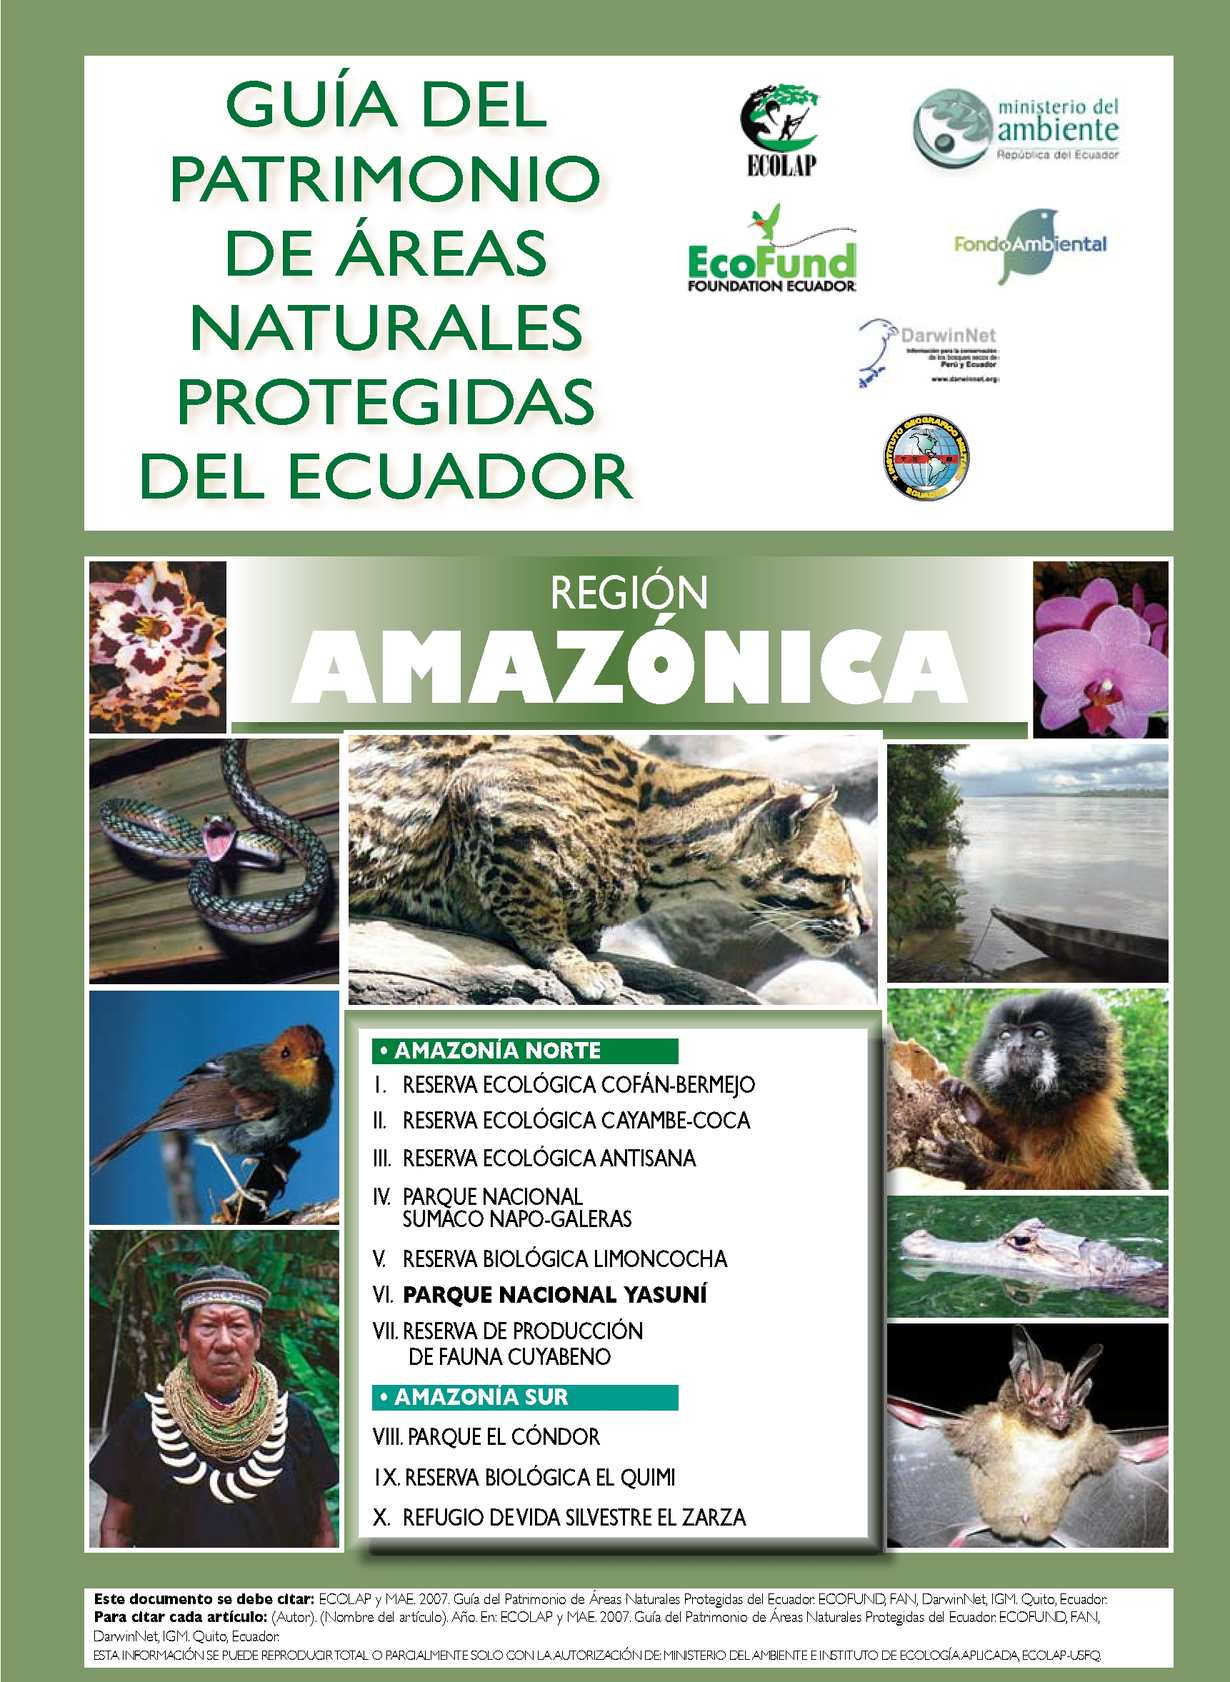 Guia de patrimonio Ecuatoriano_ Amazonia